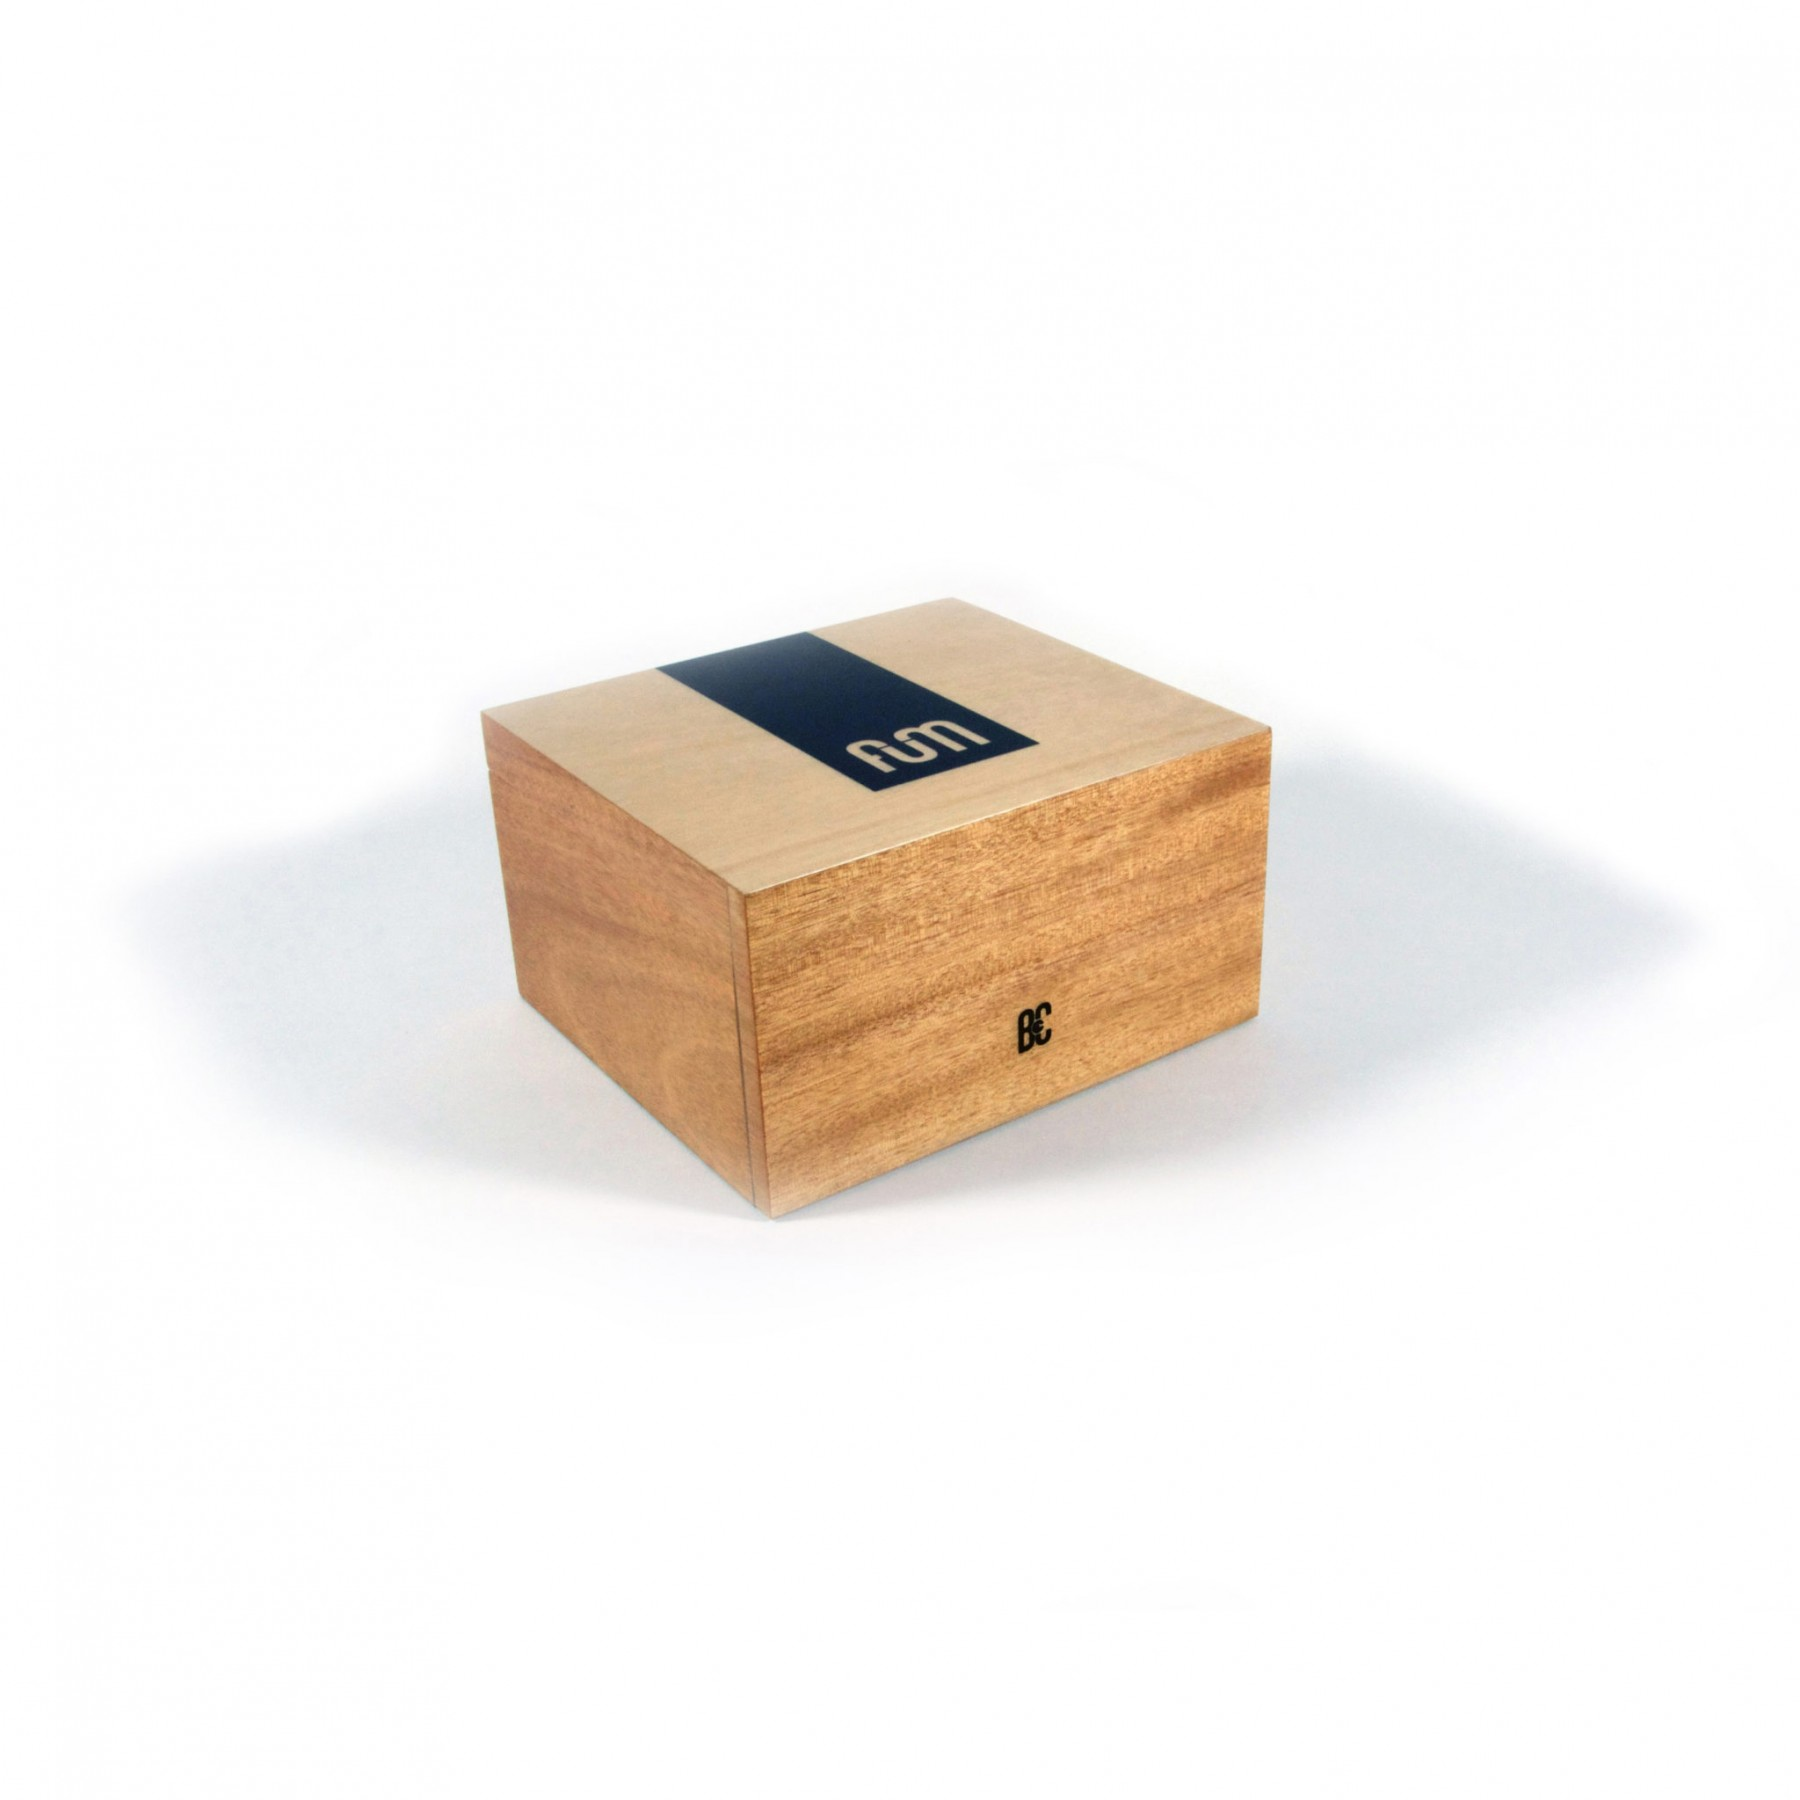 Caja FumBox de Curado Humidor conservar marihuana 0